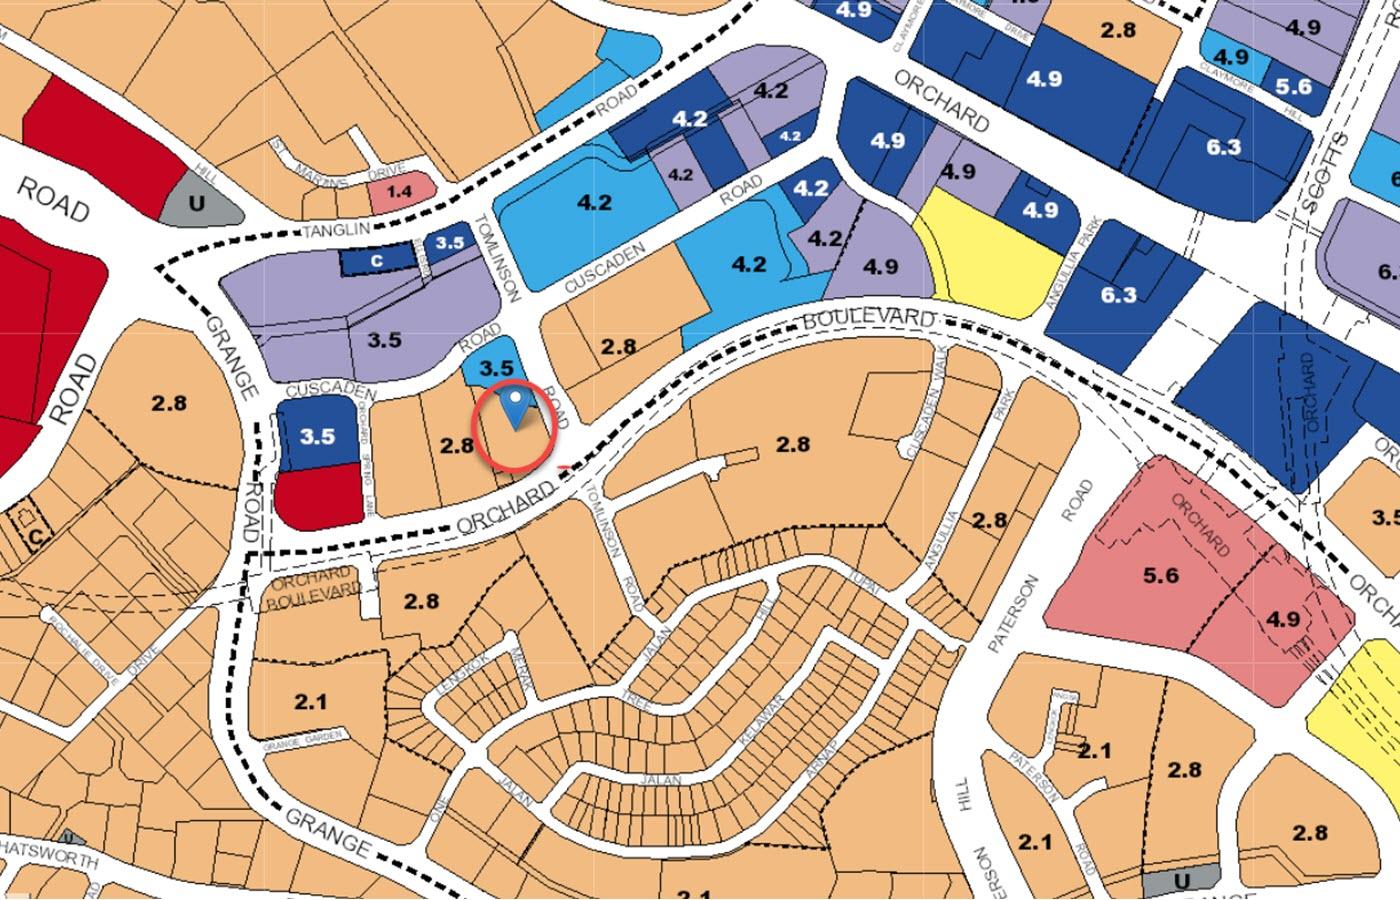 Park Nova Condo Location - URA Master Plan Map